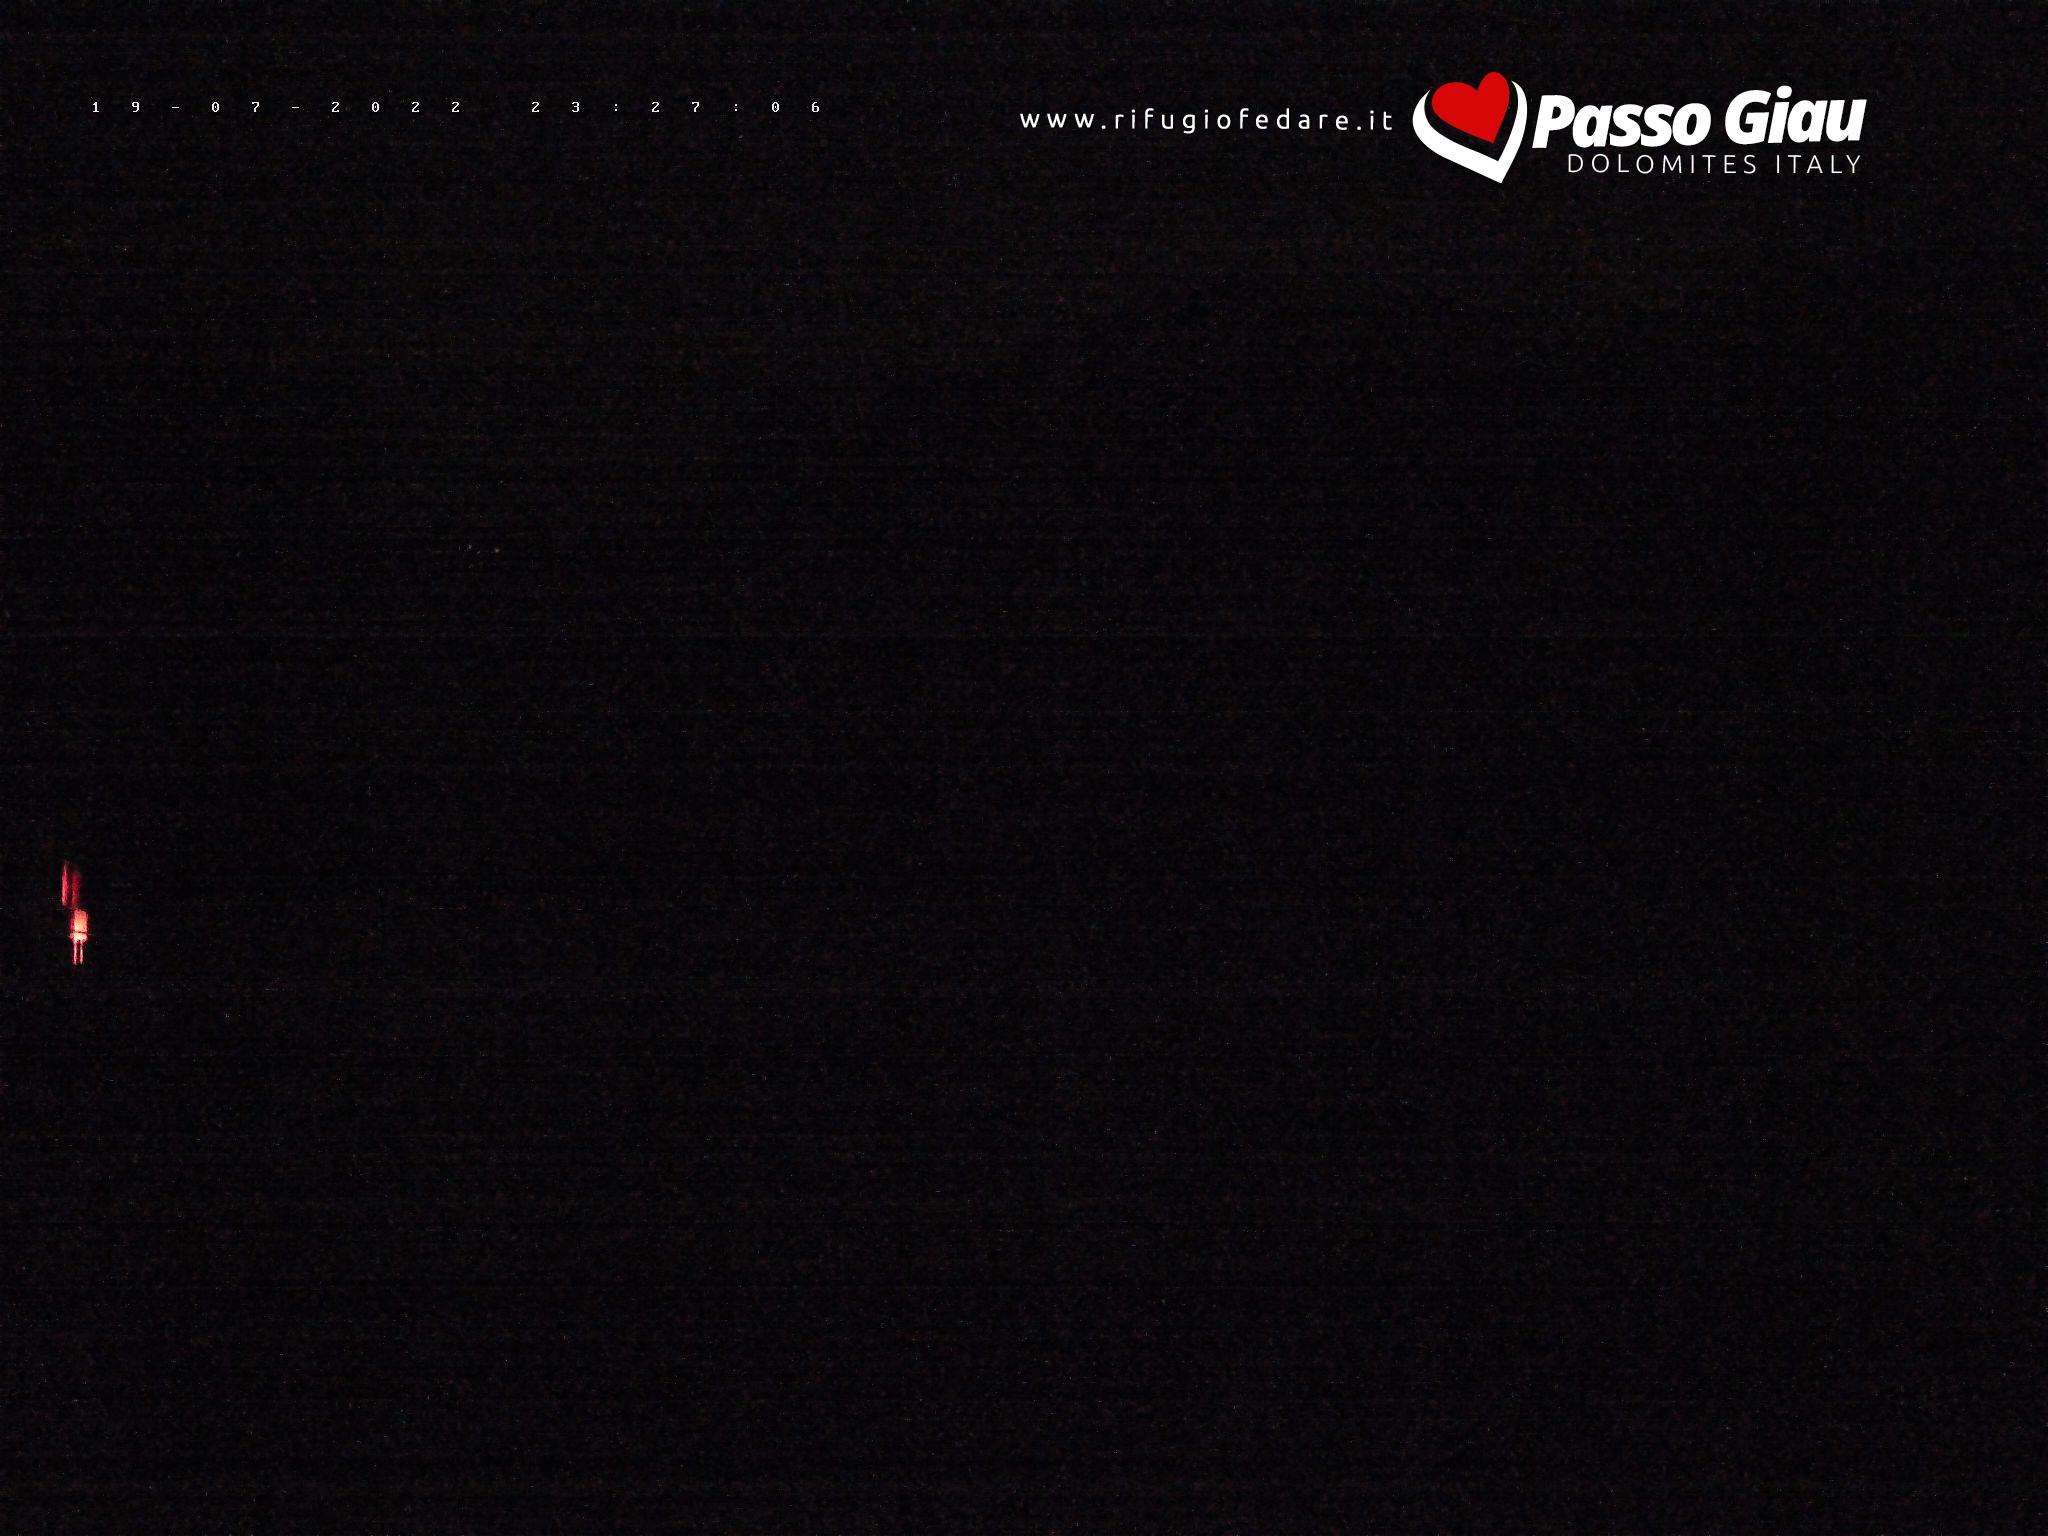 Die Hütte Rifugio Fedare und Giau Fedare Sesselift